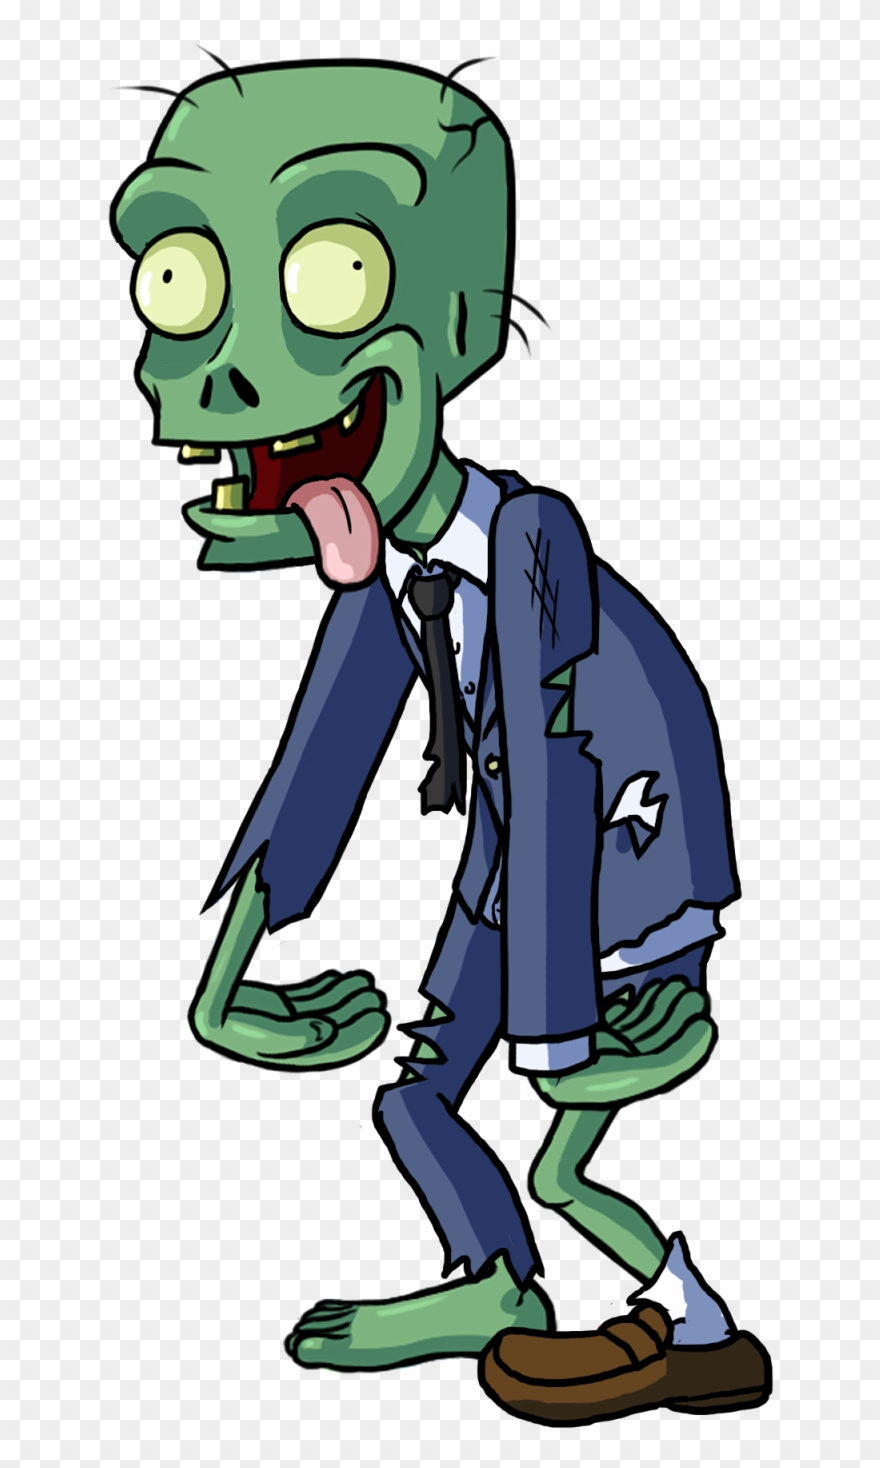 Zombie clipart transparent background. Download cartoon